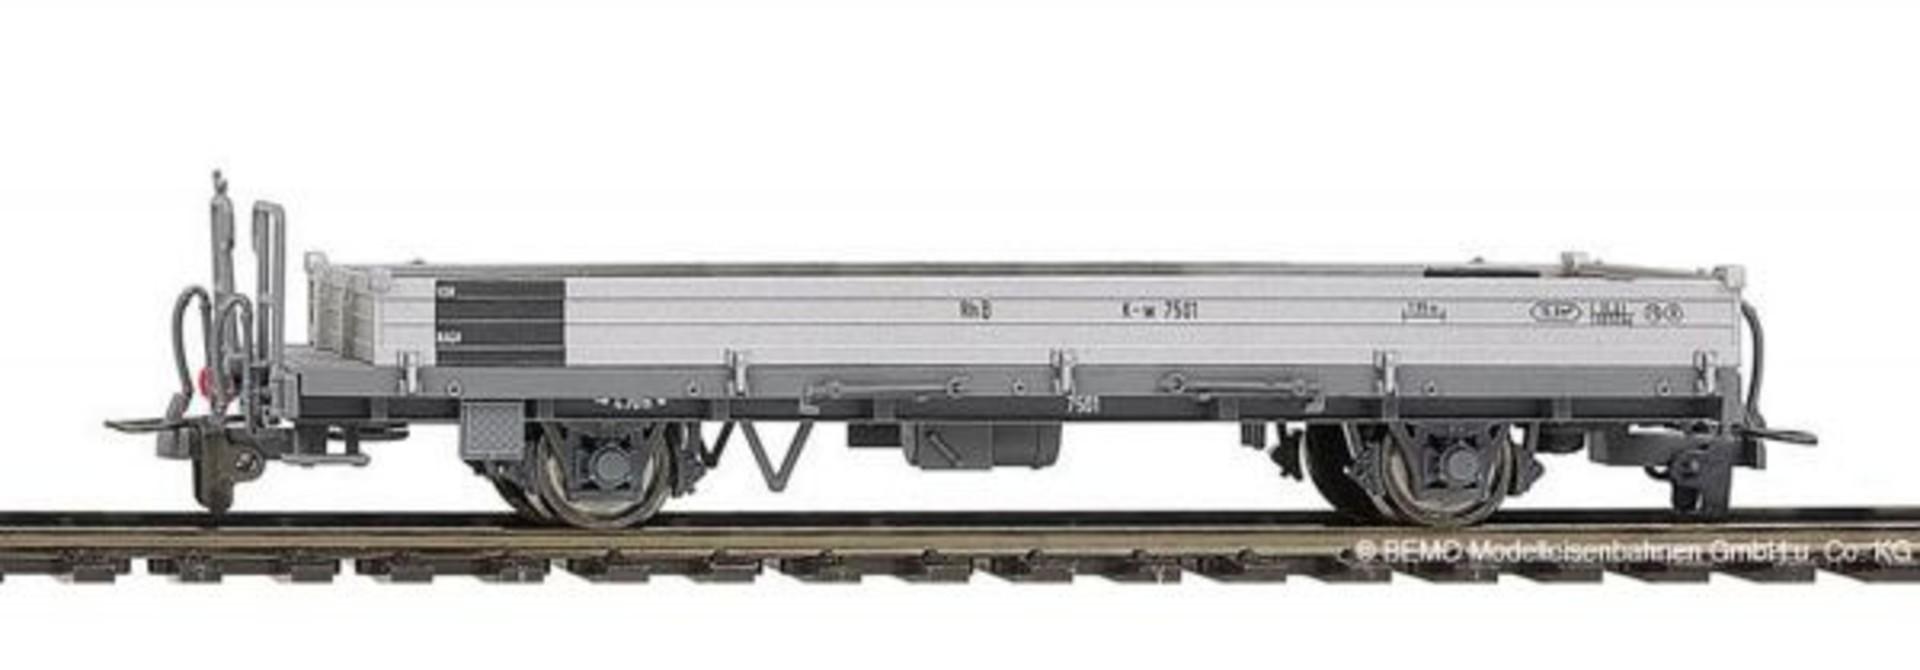 2267105  RhB K-w 7505 Stahlwand-Flachwagen